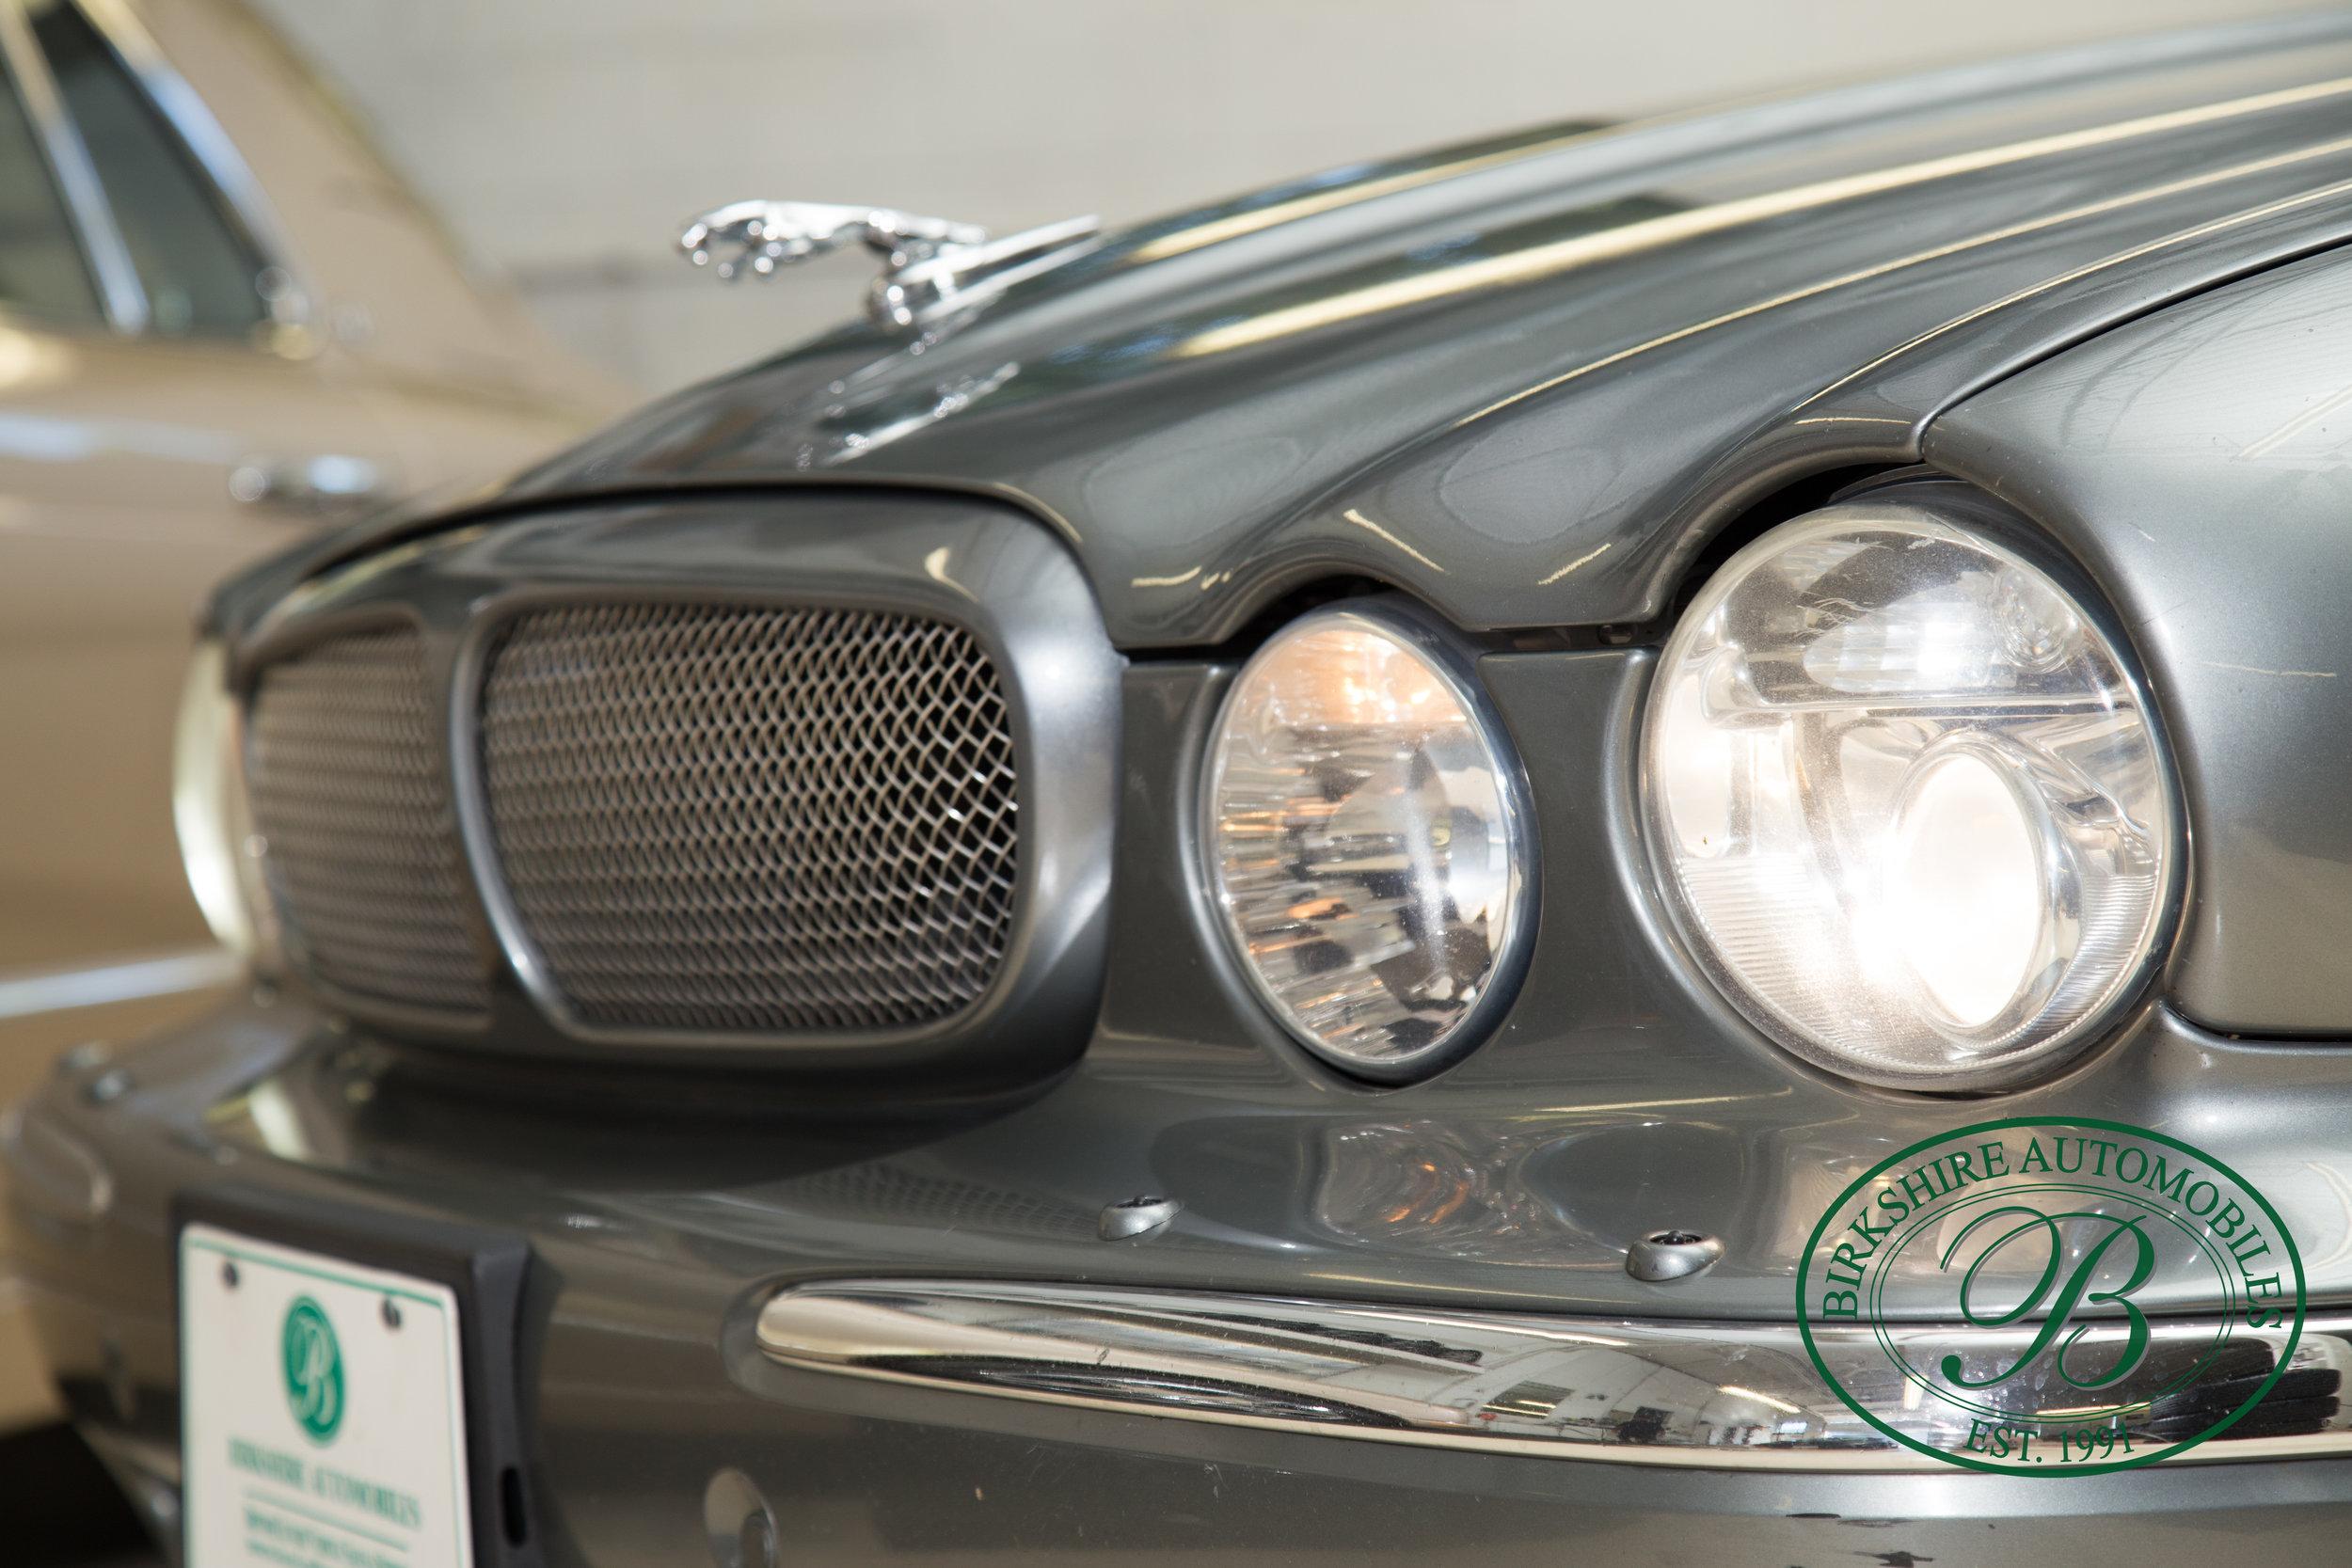 Birkshire Automobiles 2006 Jaguar XJ^-54.jpg